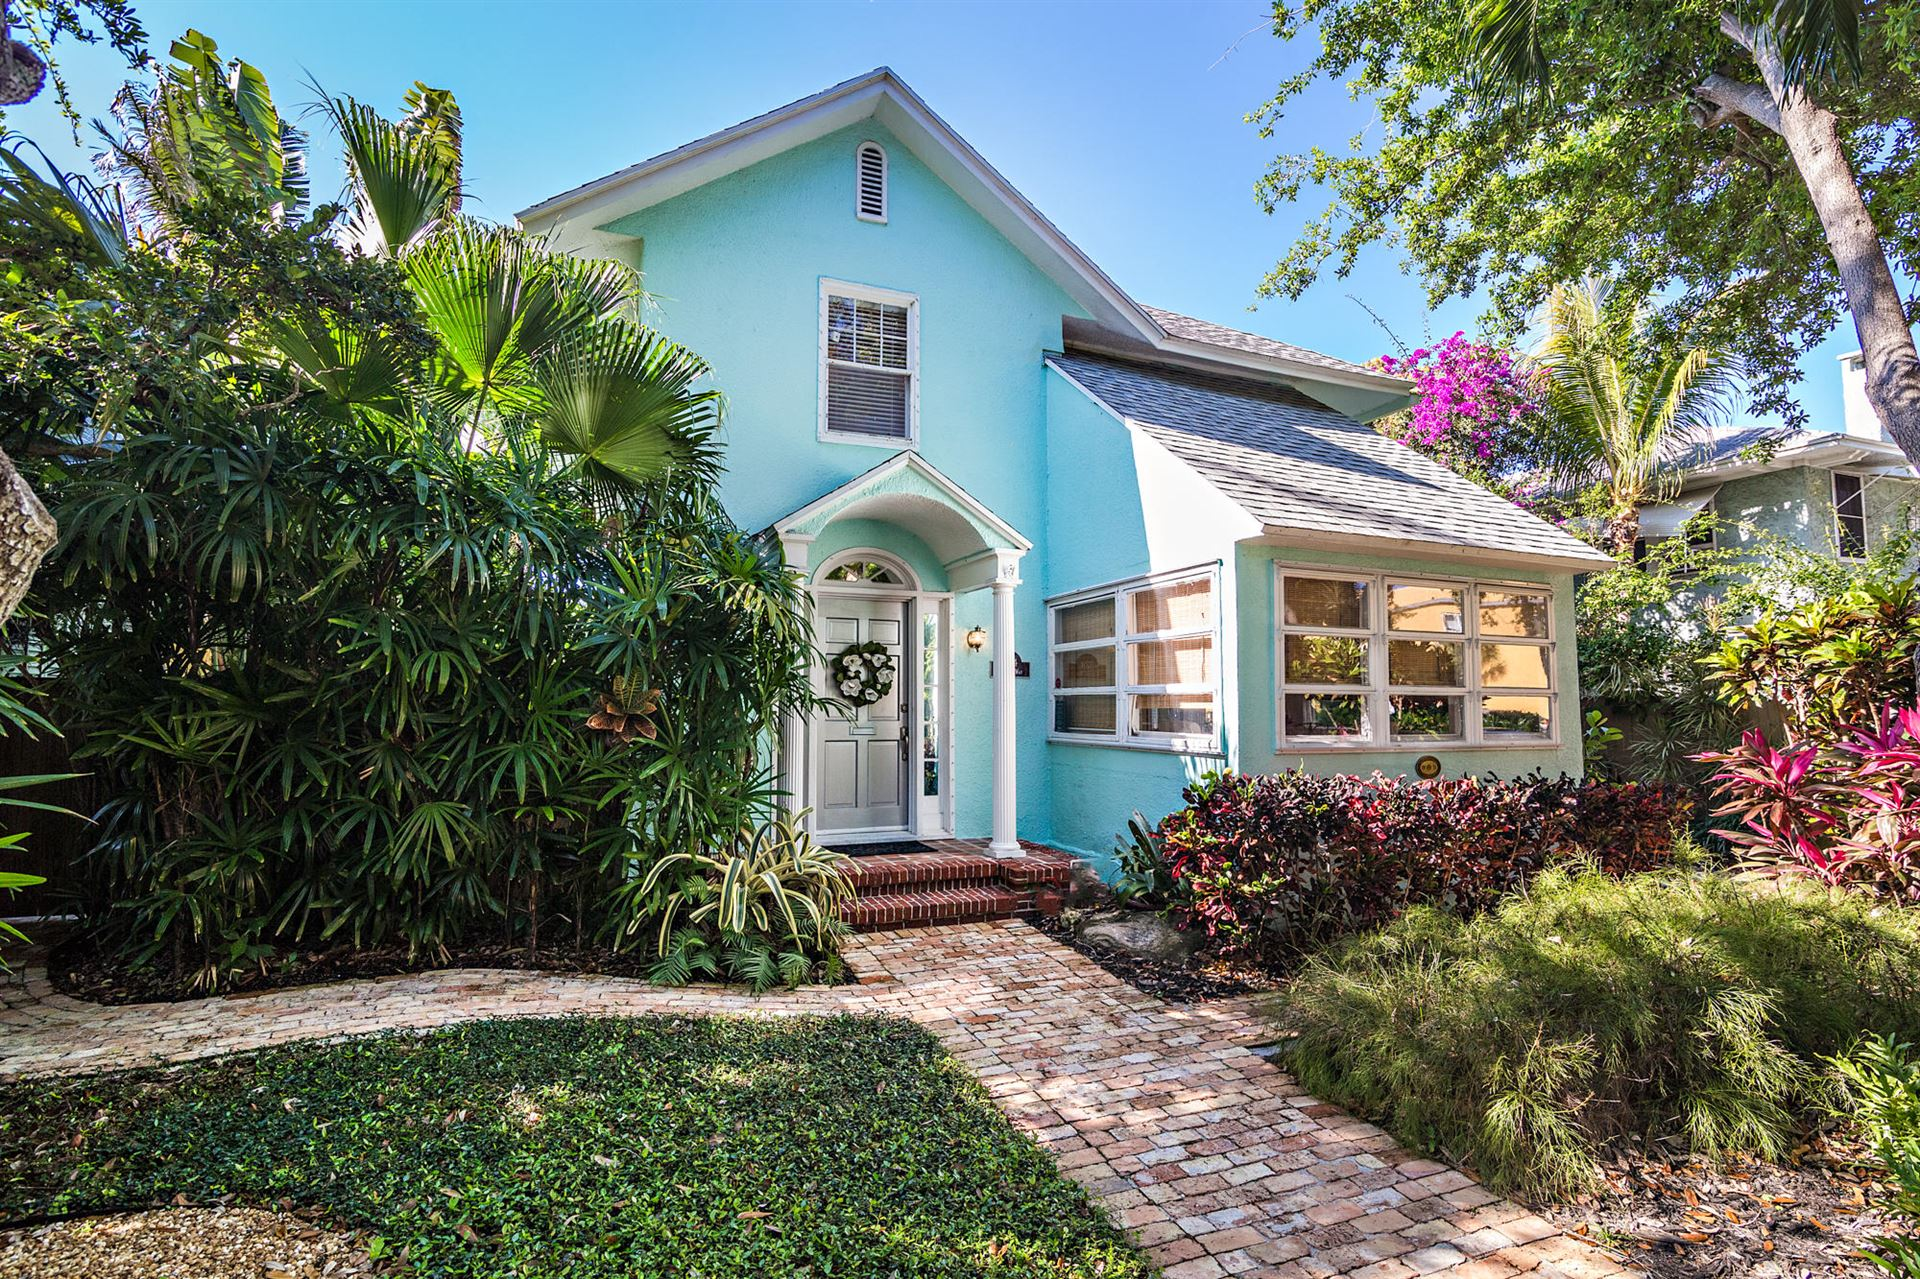 324 Croton Way, West Palm Beach, FL 33401 - #: RX-10611046